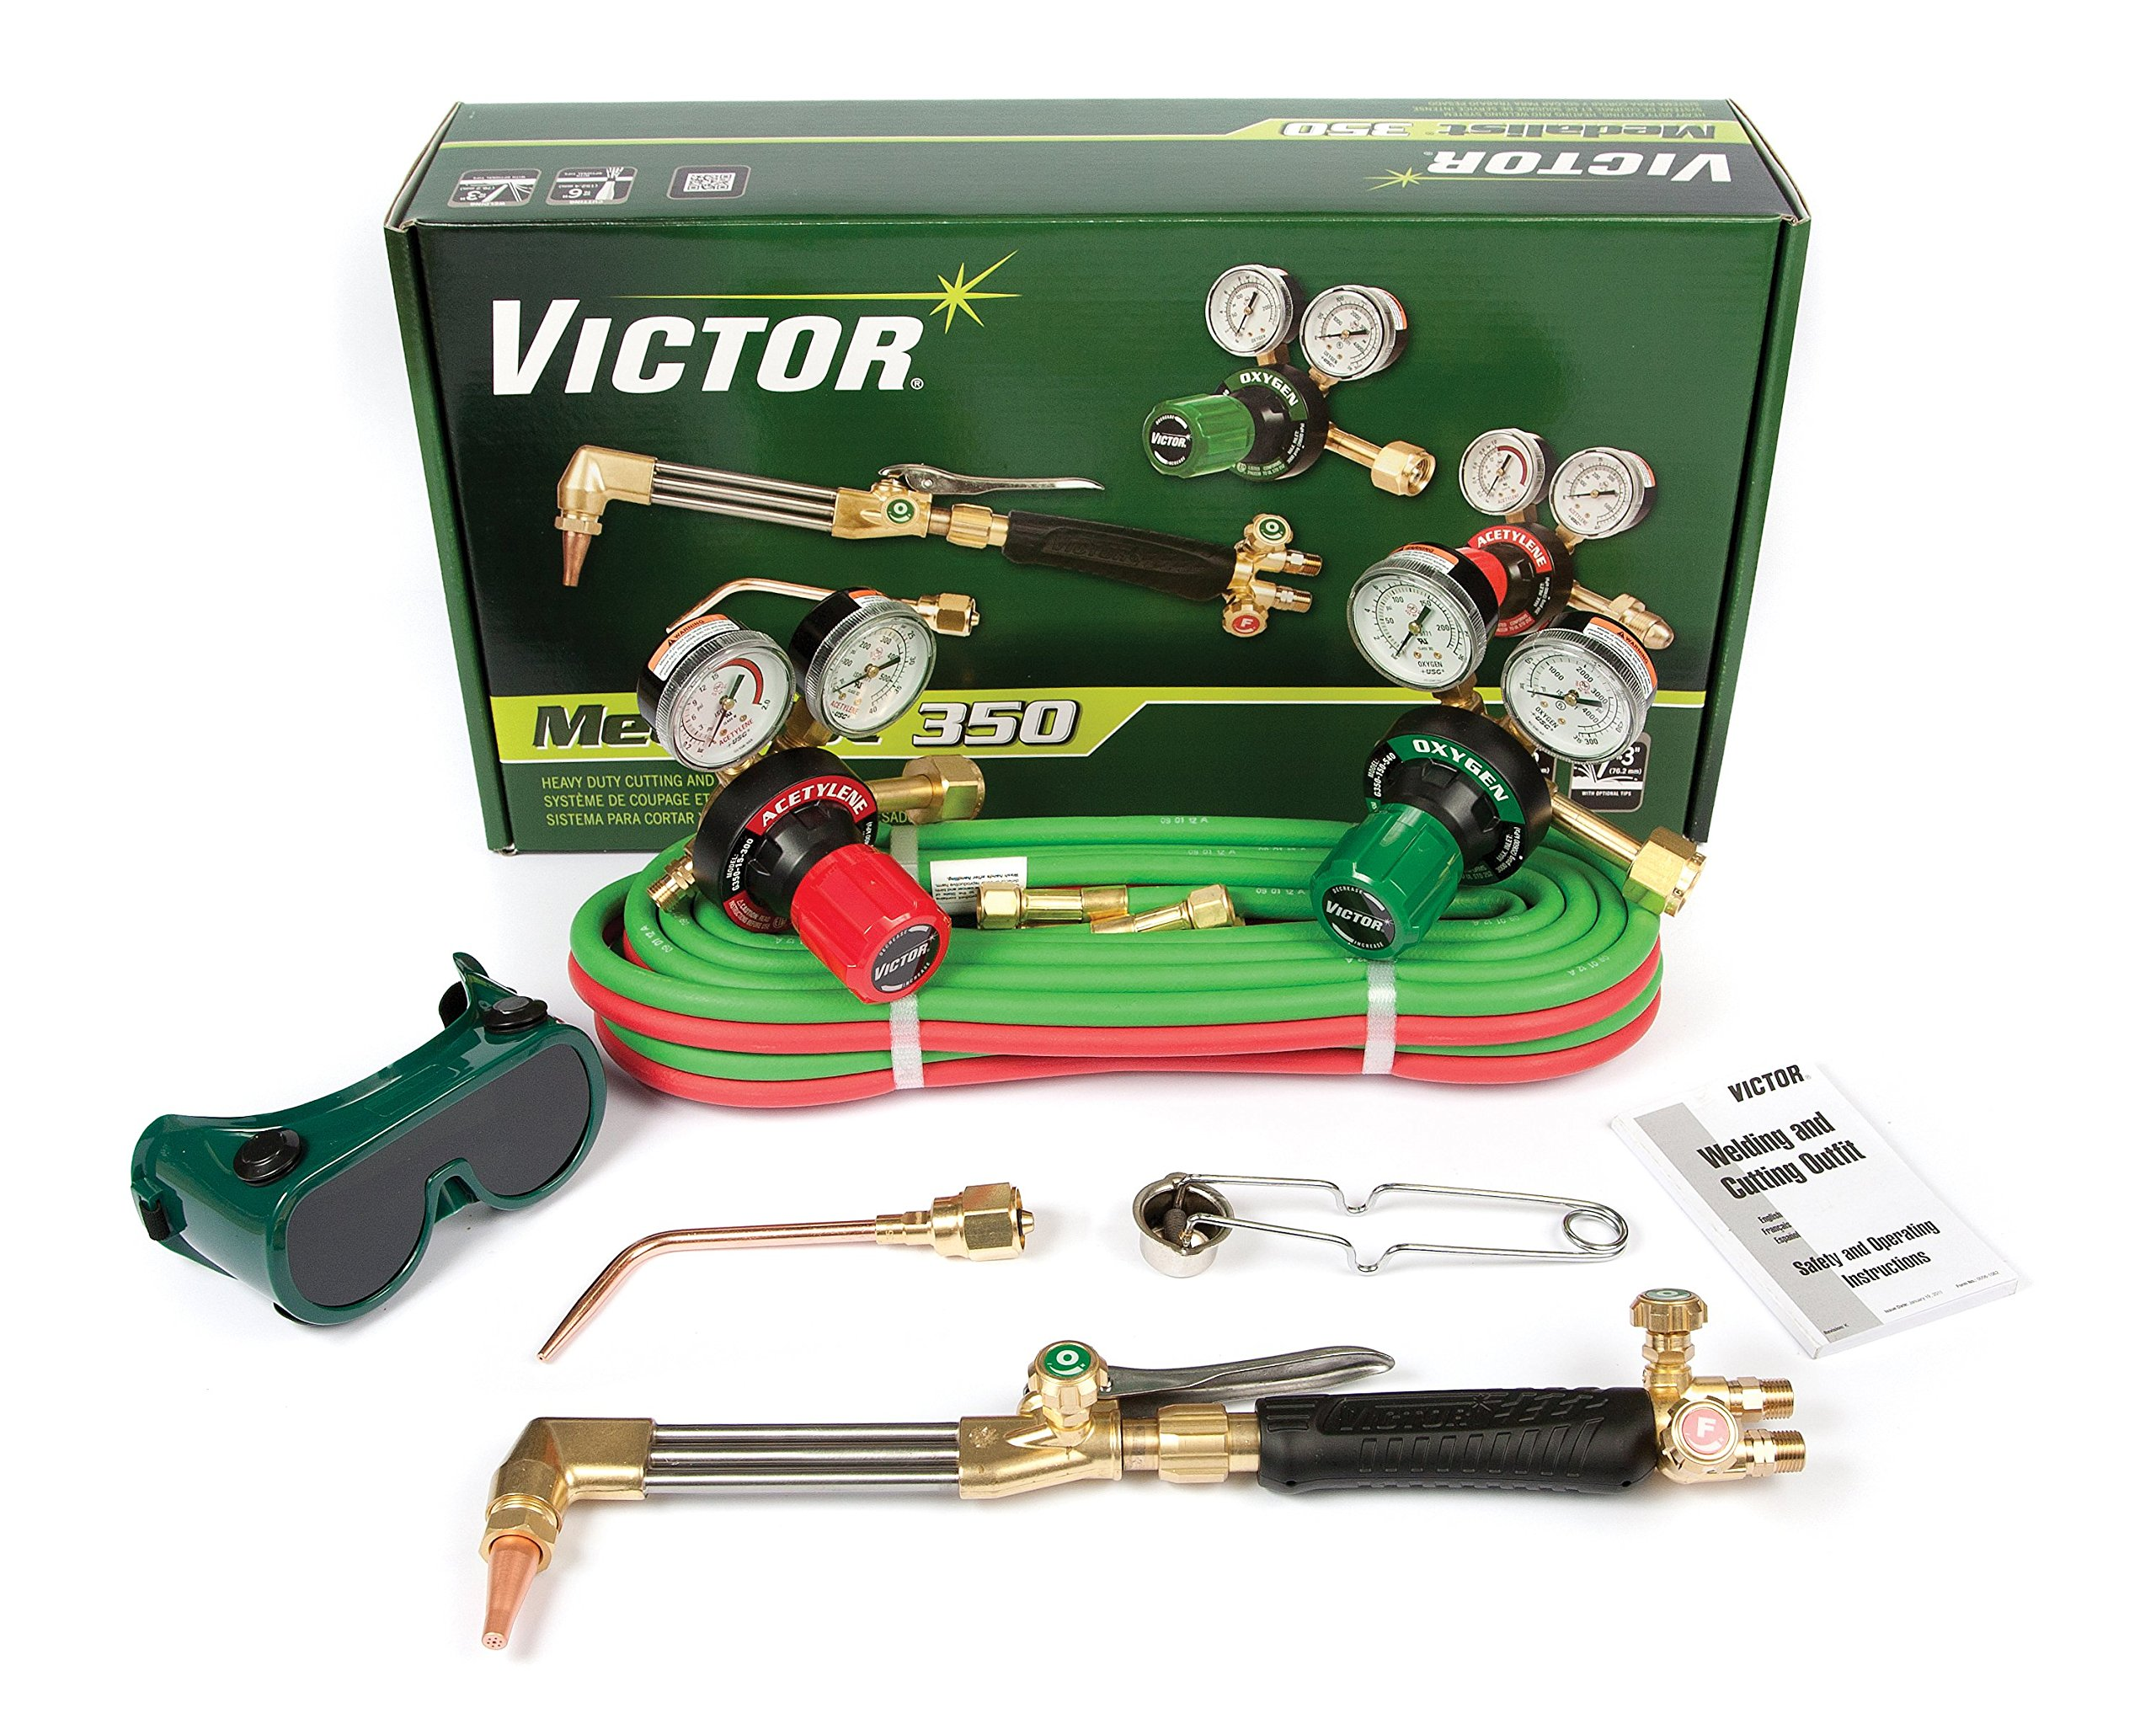 Victor Technologies 0384-2691 Medalist 350 System Heavy Duty Cutting System, Acetylene Gas Service, G350-15-300 Fuel Gas Regulator by ESAB